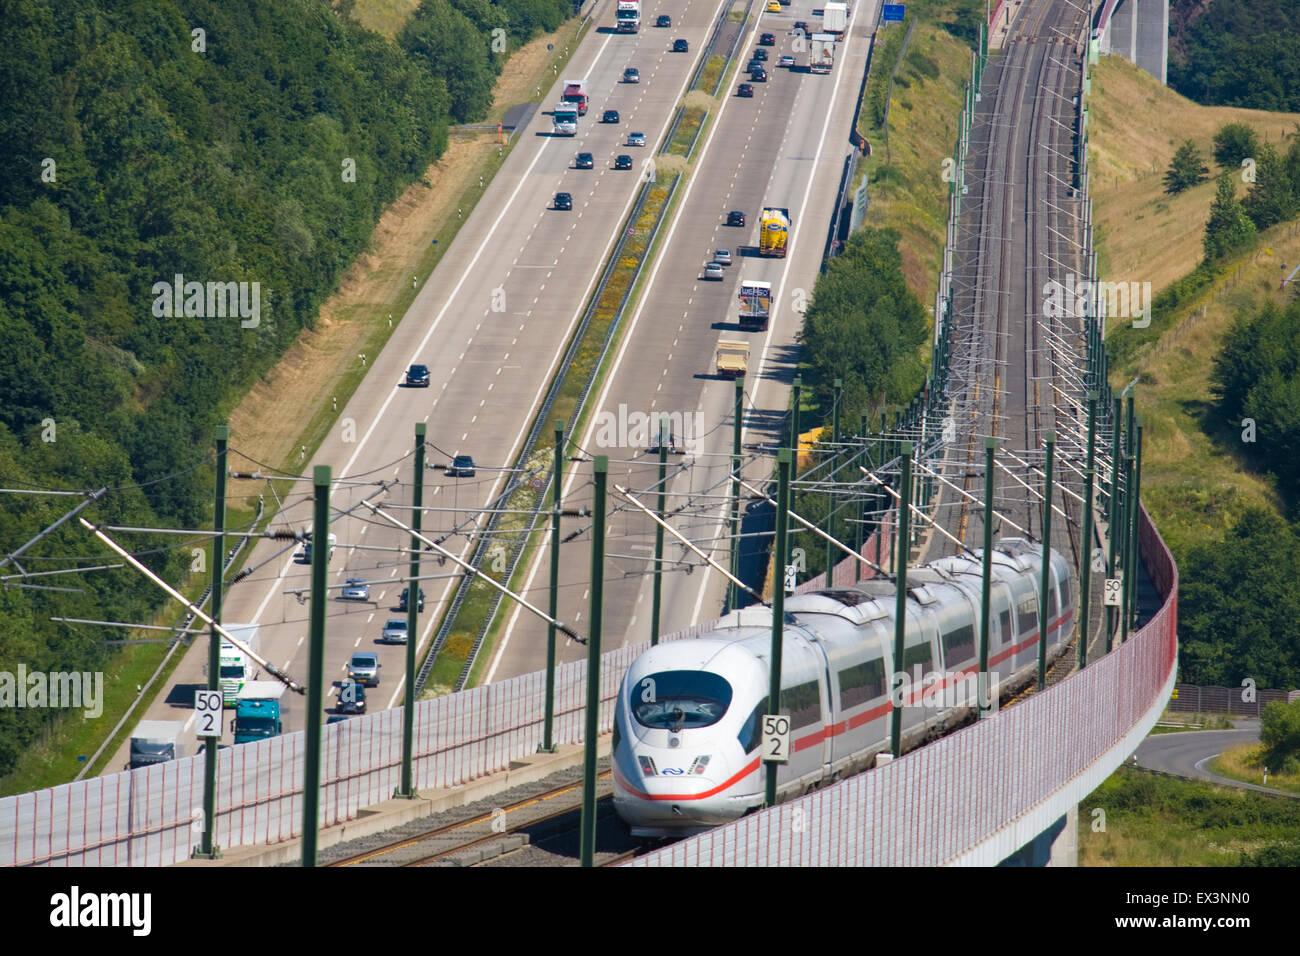 Europe, Germany, Rhineland-Palatinate, high-speed train